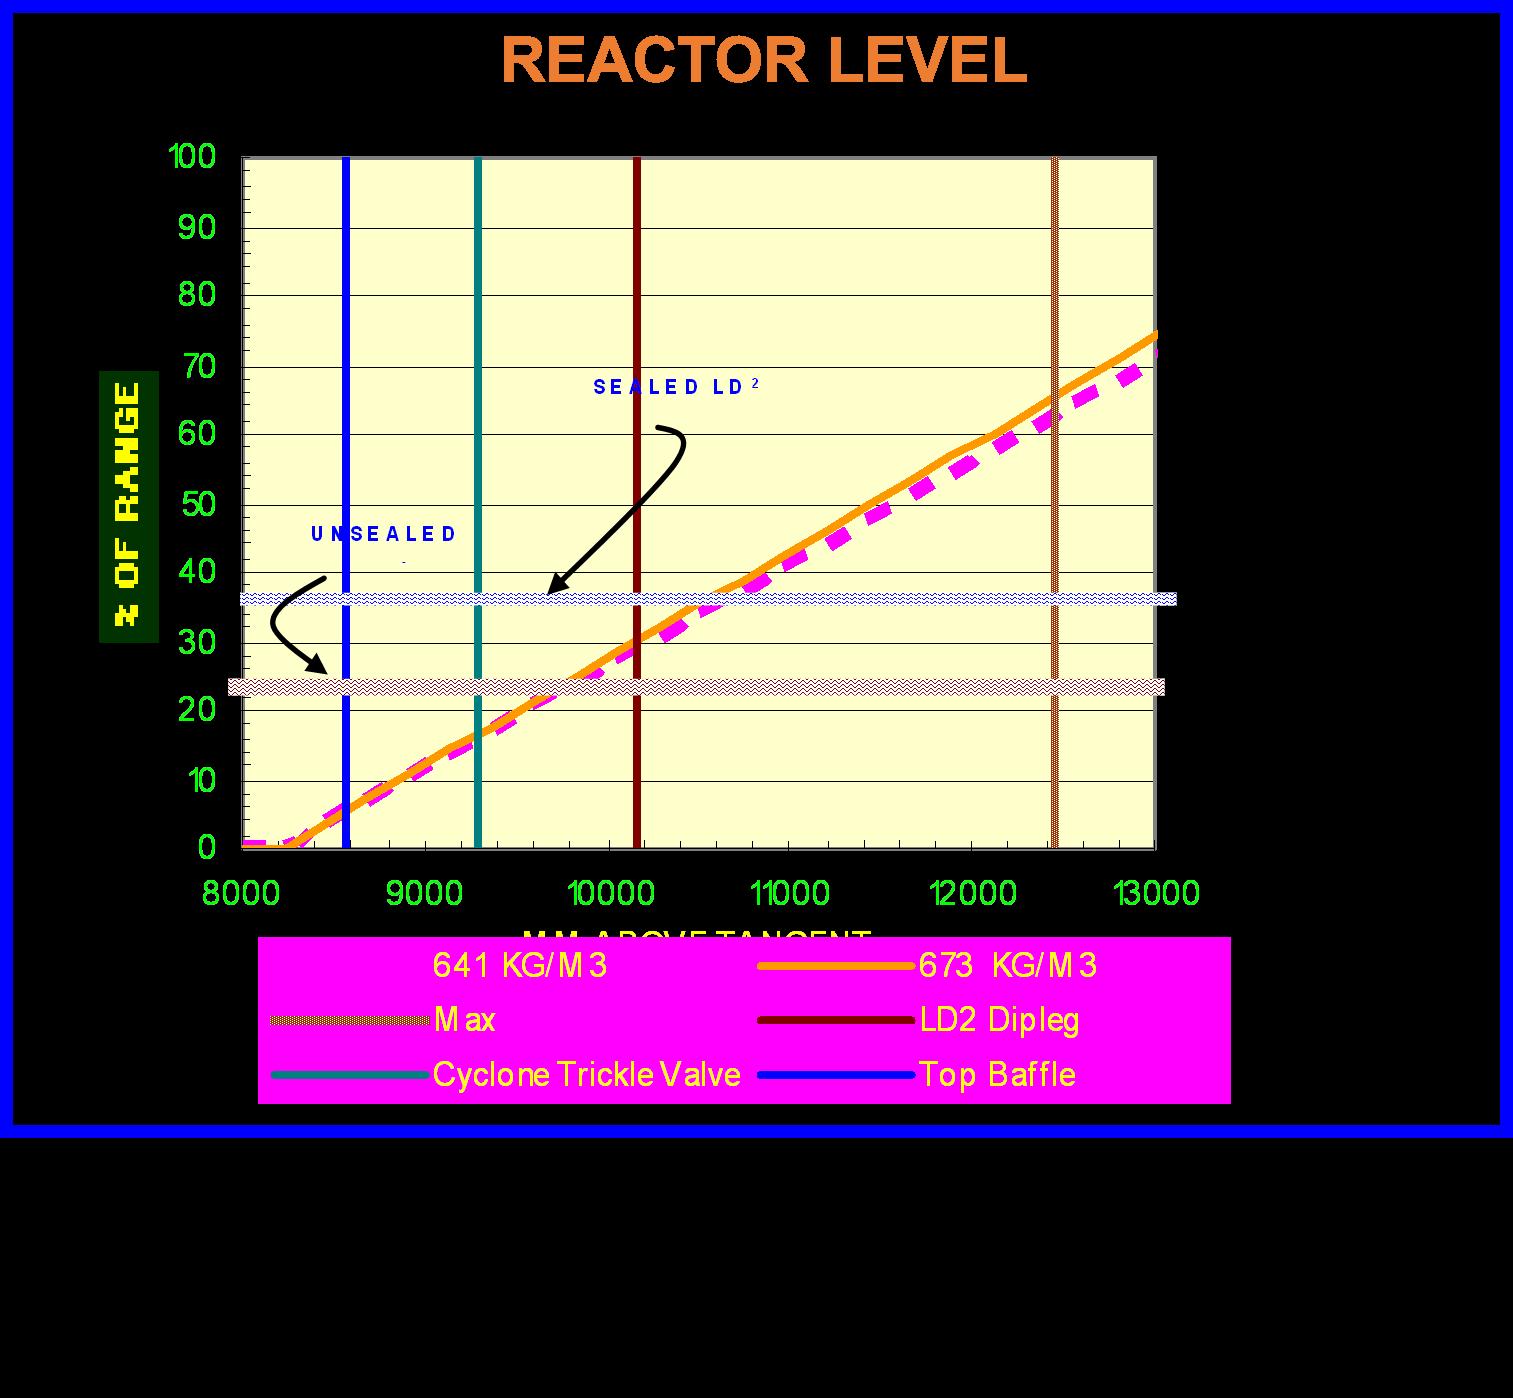 Wiring Diagram For Kellogg Compressorwith Centrifugal Unloader Valve Slide Valves Fcc Refinery Training Network At